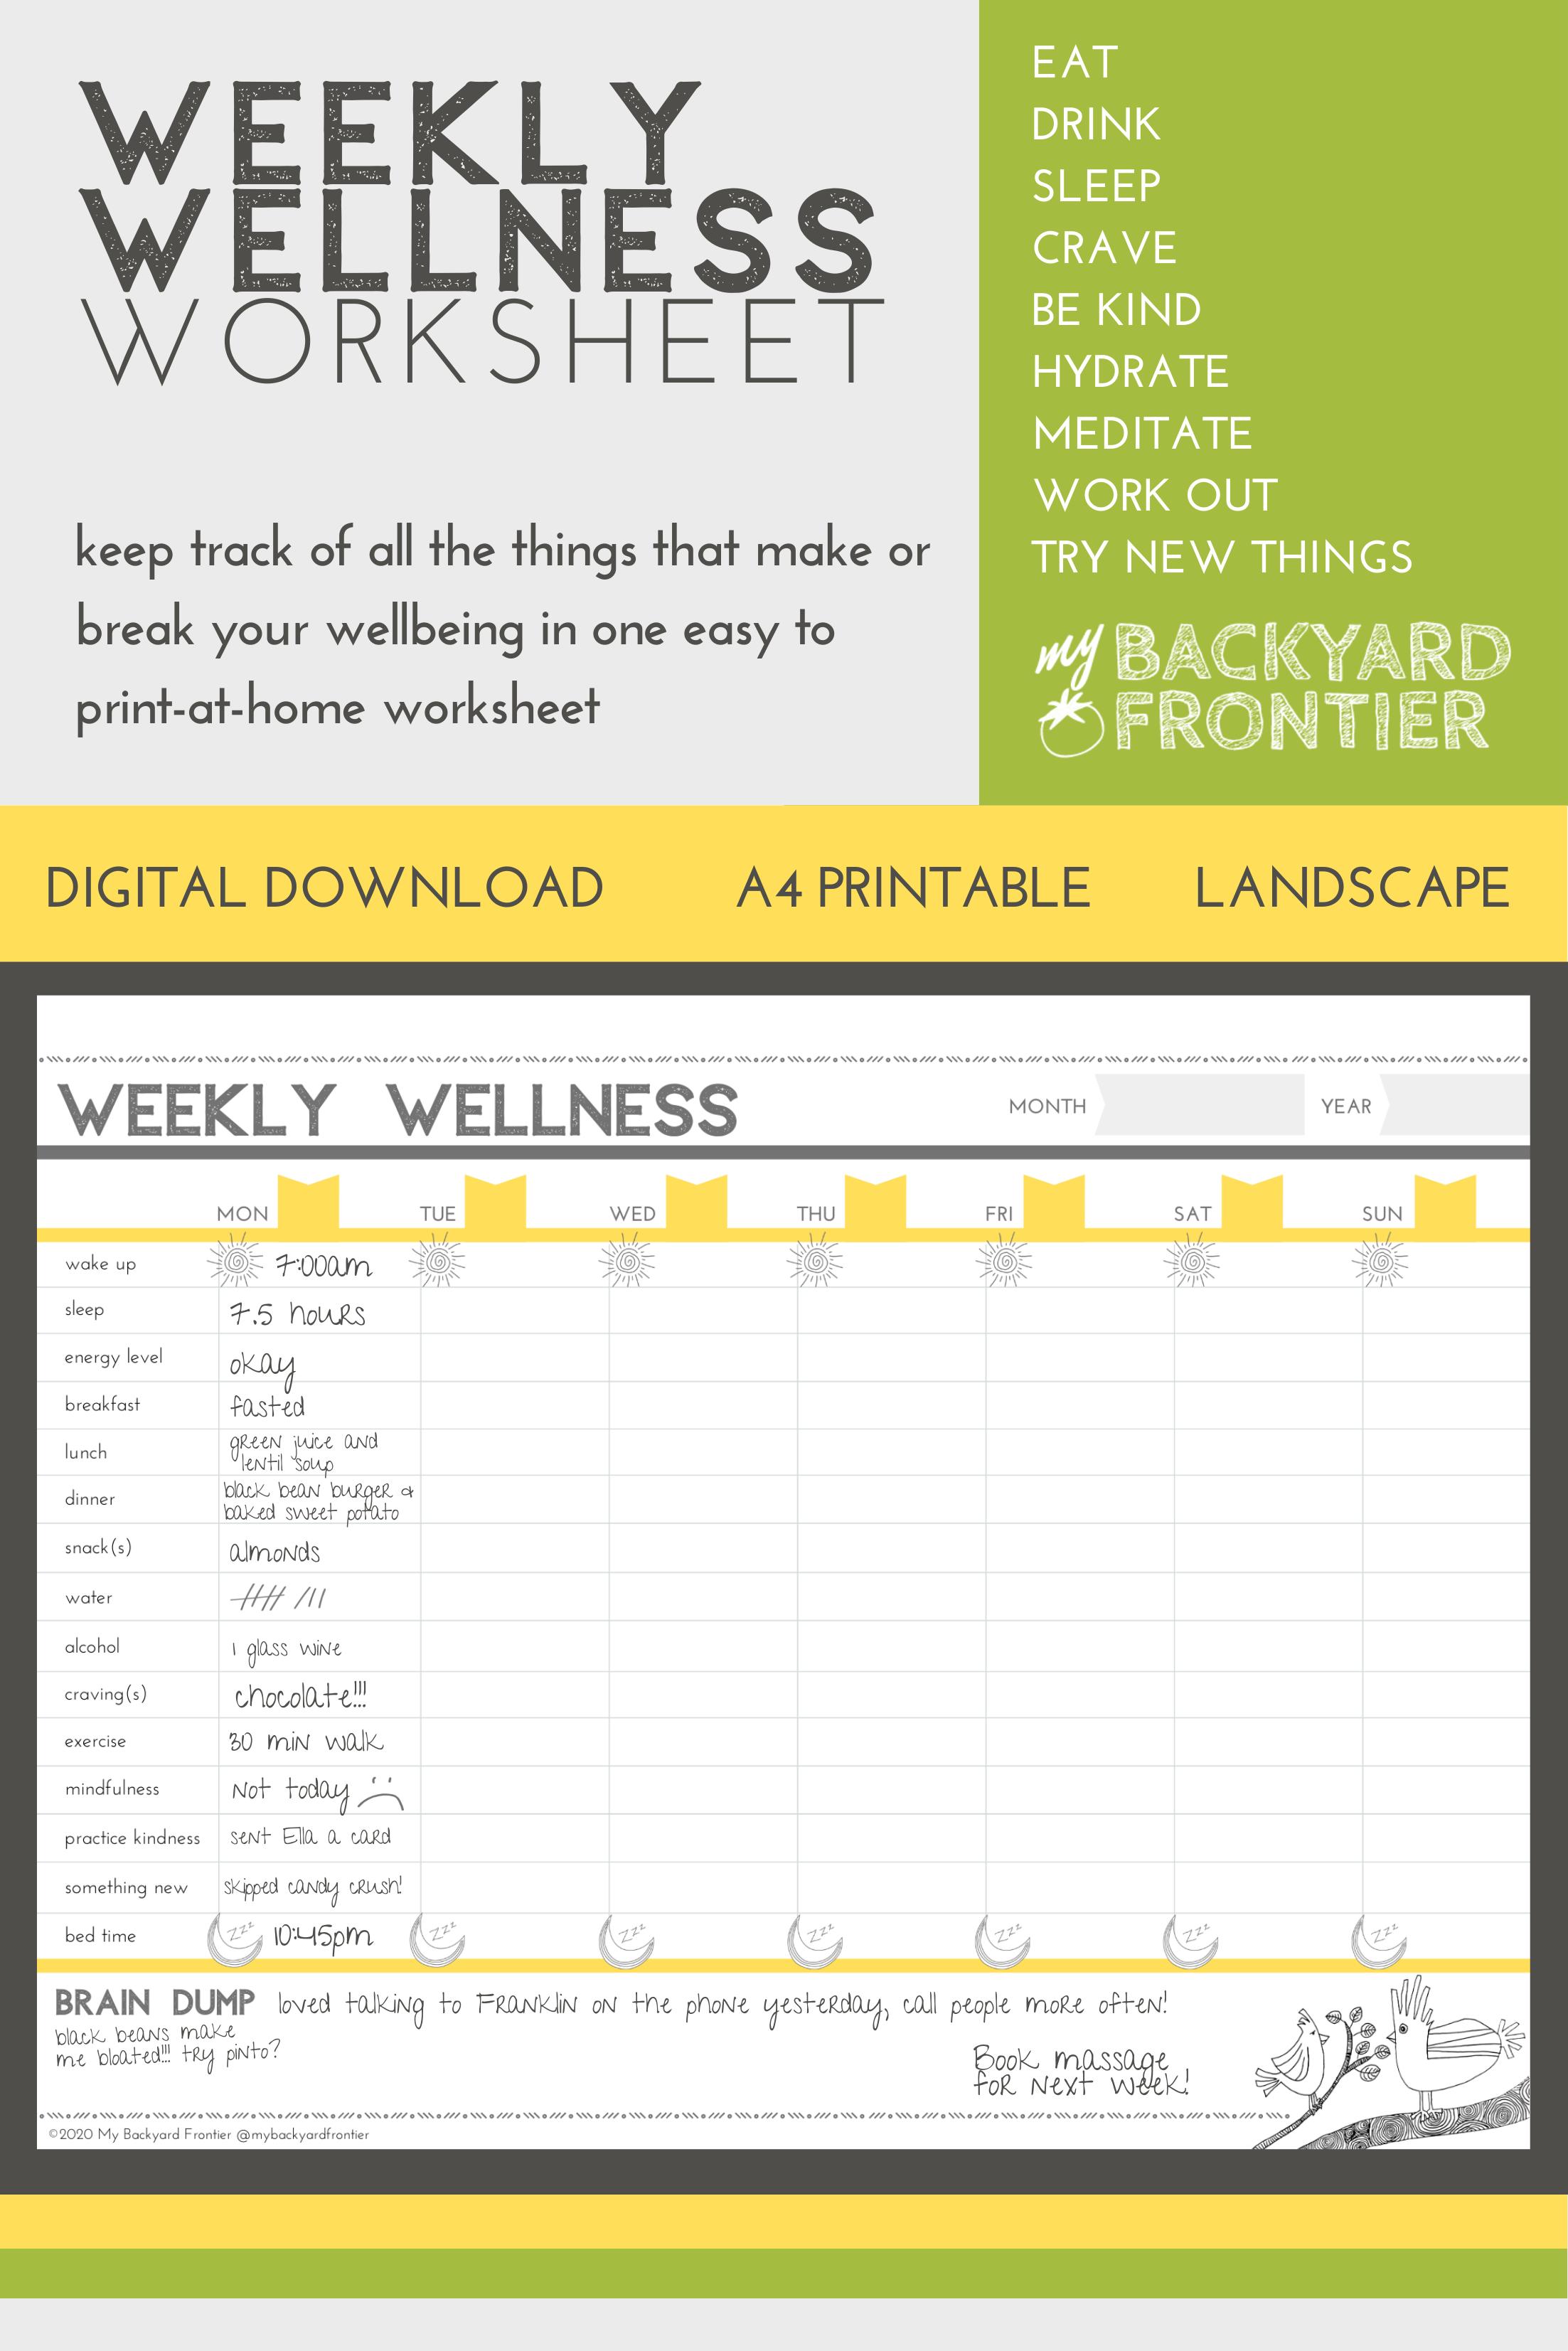 Printable Food Mood Fitness Mindfulness Journal